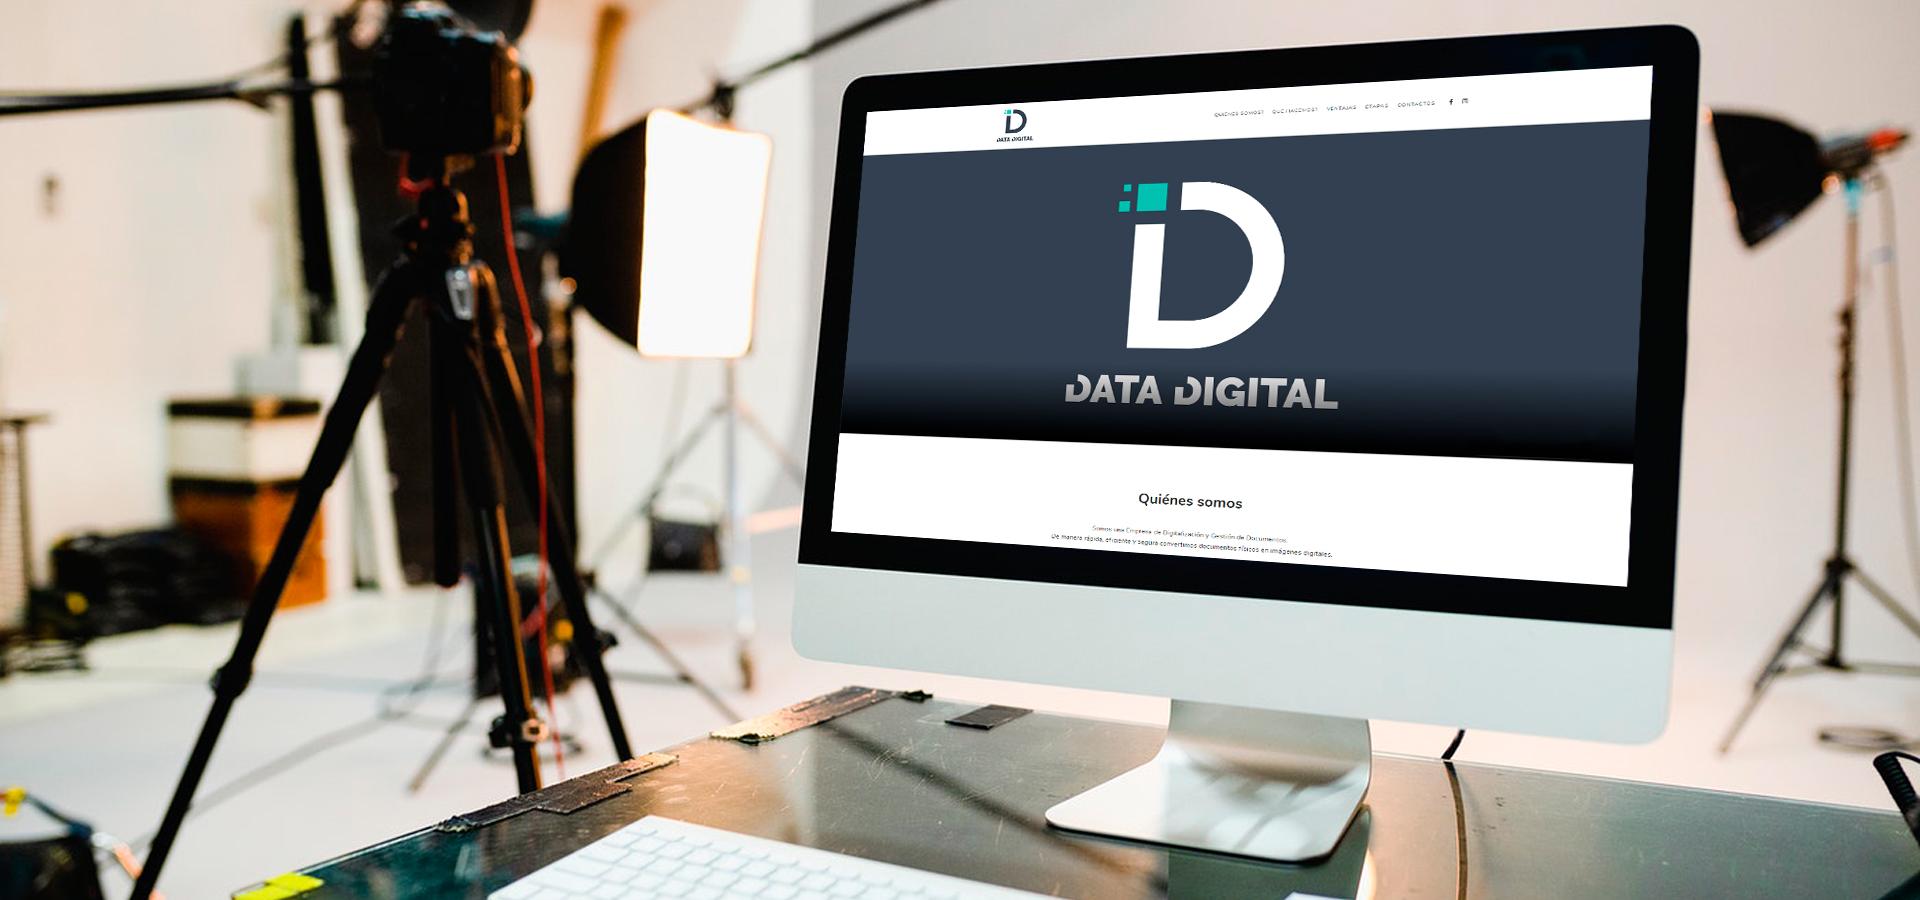 Data Digital